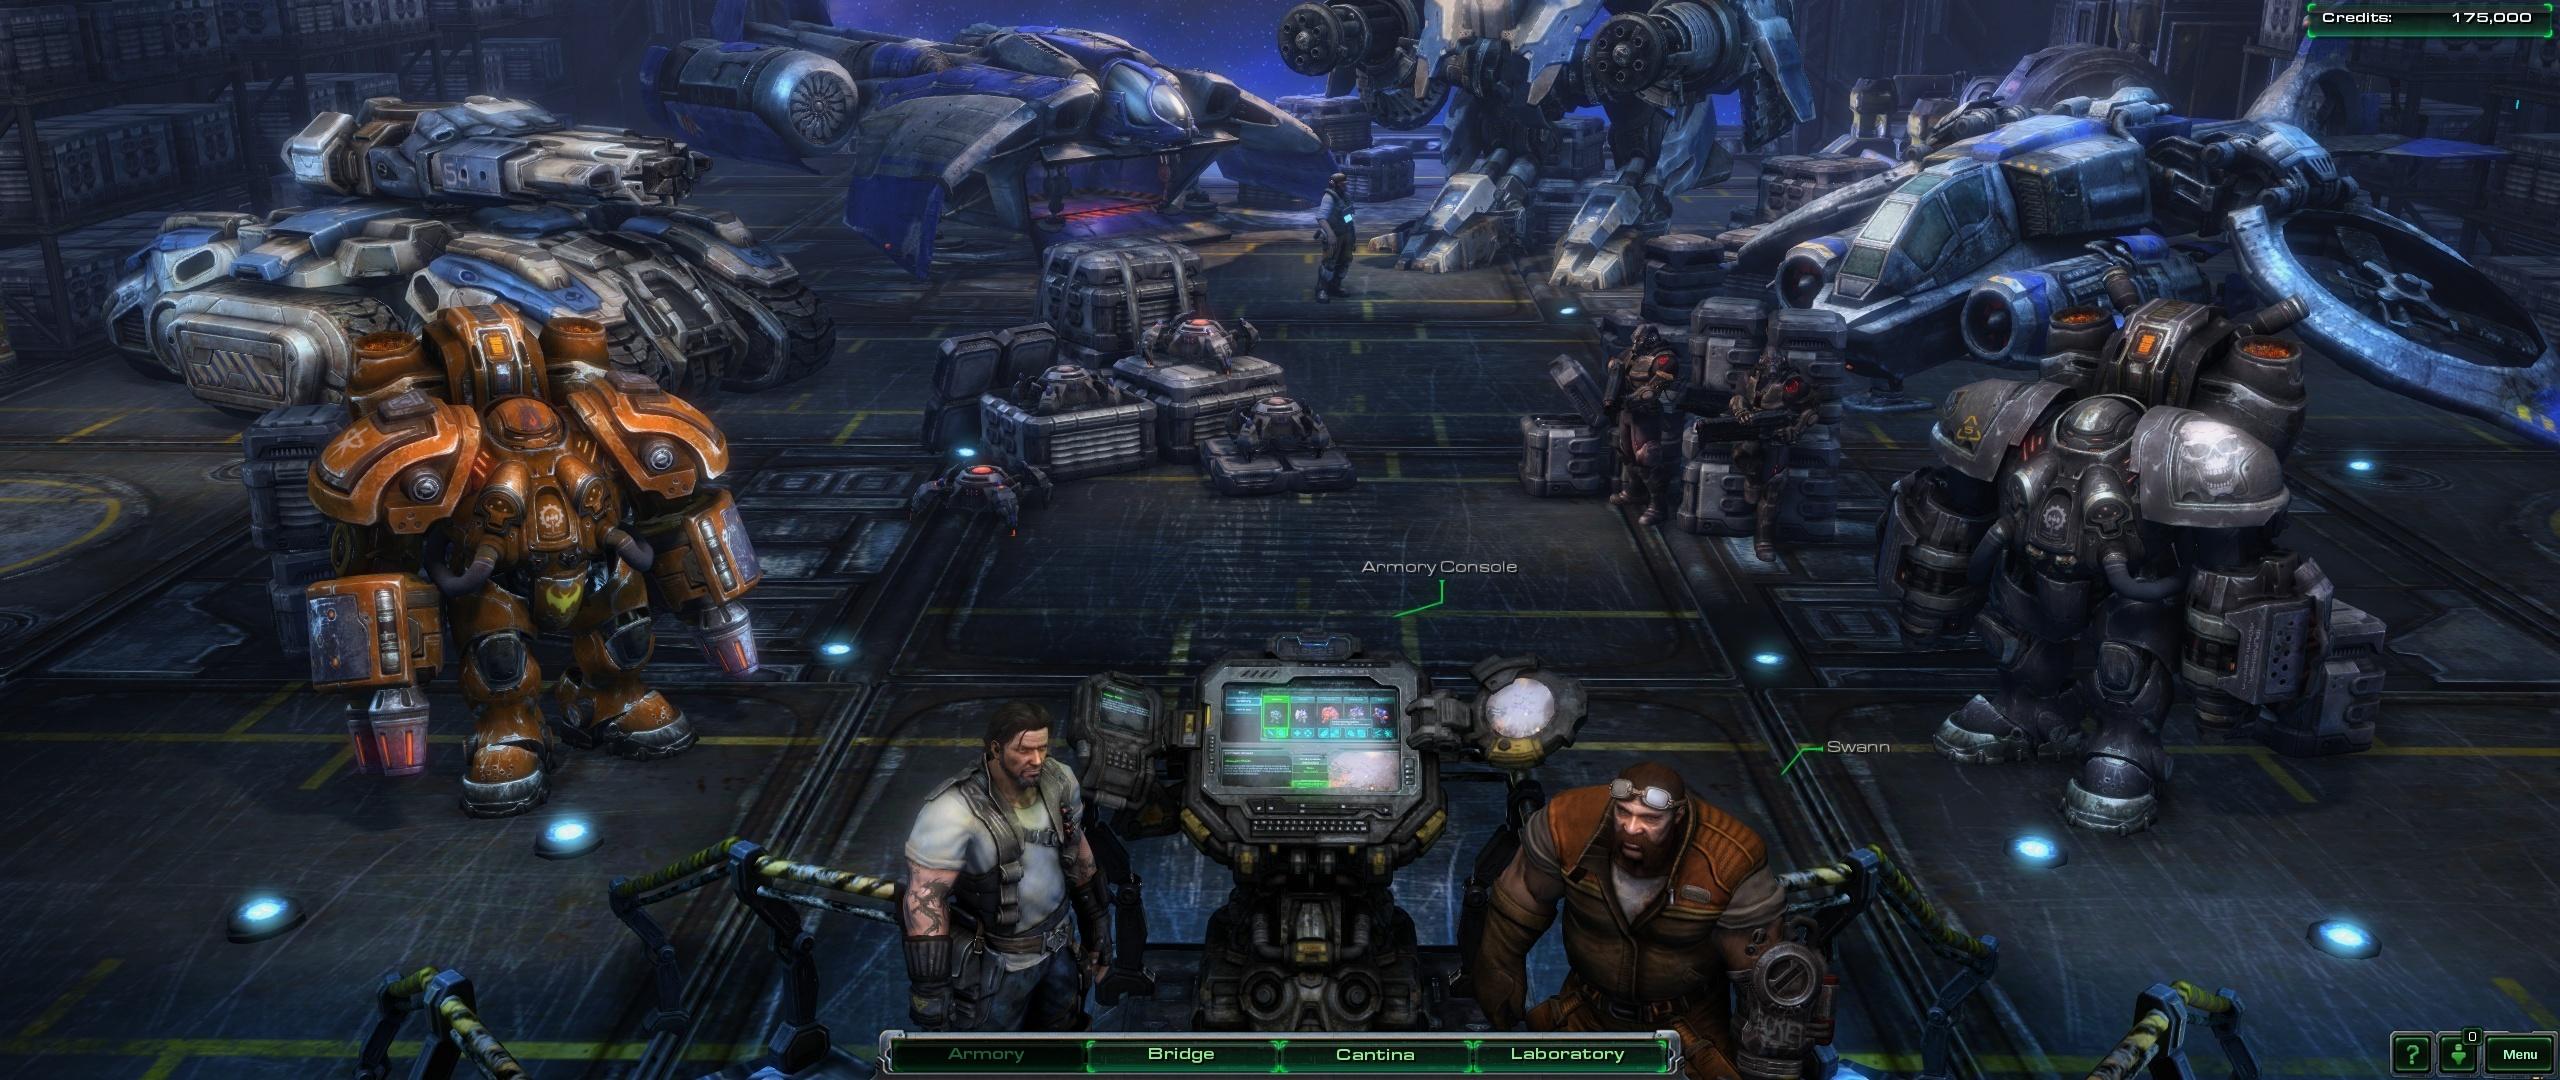 WSGF • View topic - Starscraft 2 21:9 and multi-monitor finally!